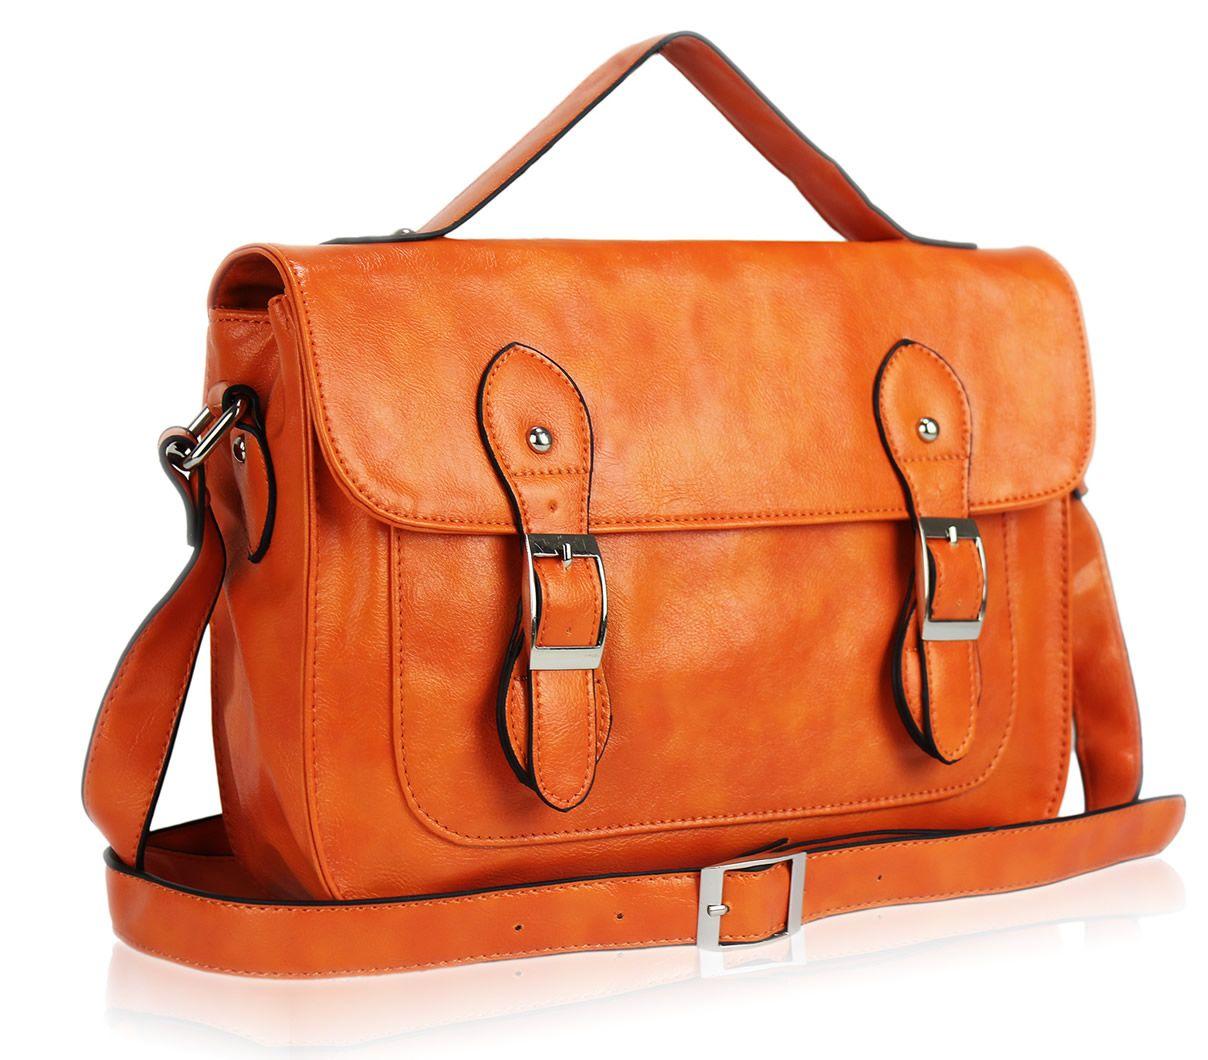 Womens Satchel Bags – TrendBags 2017